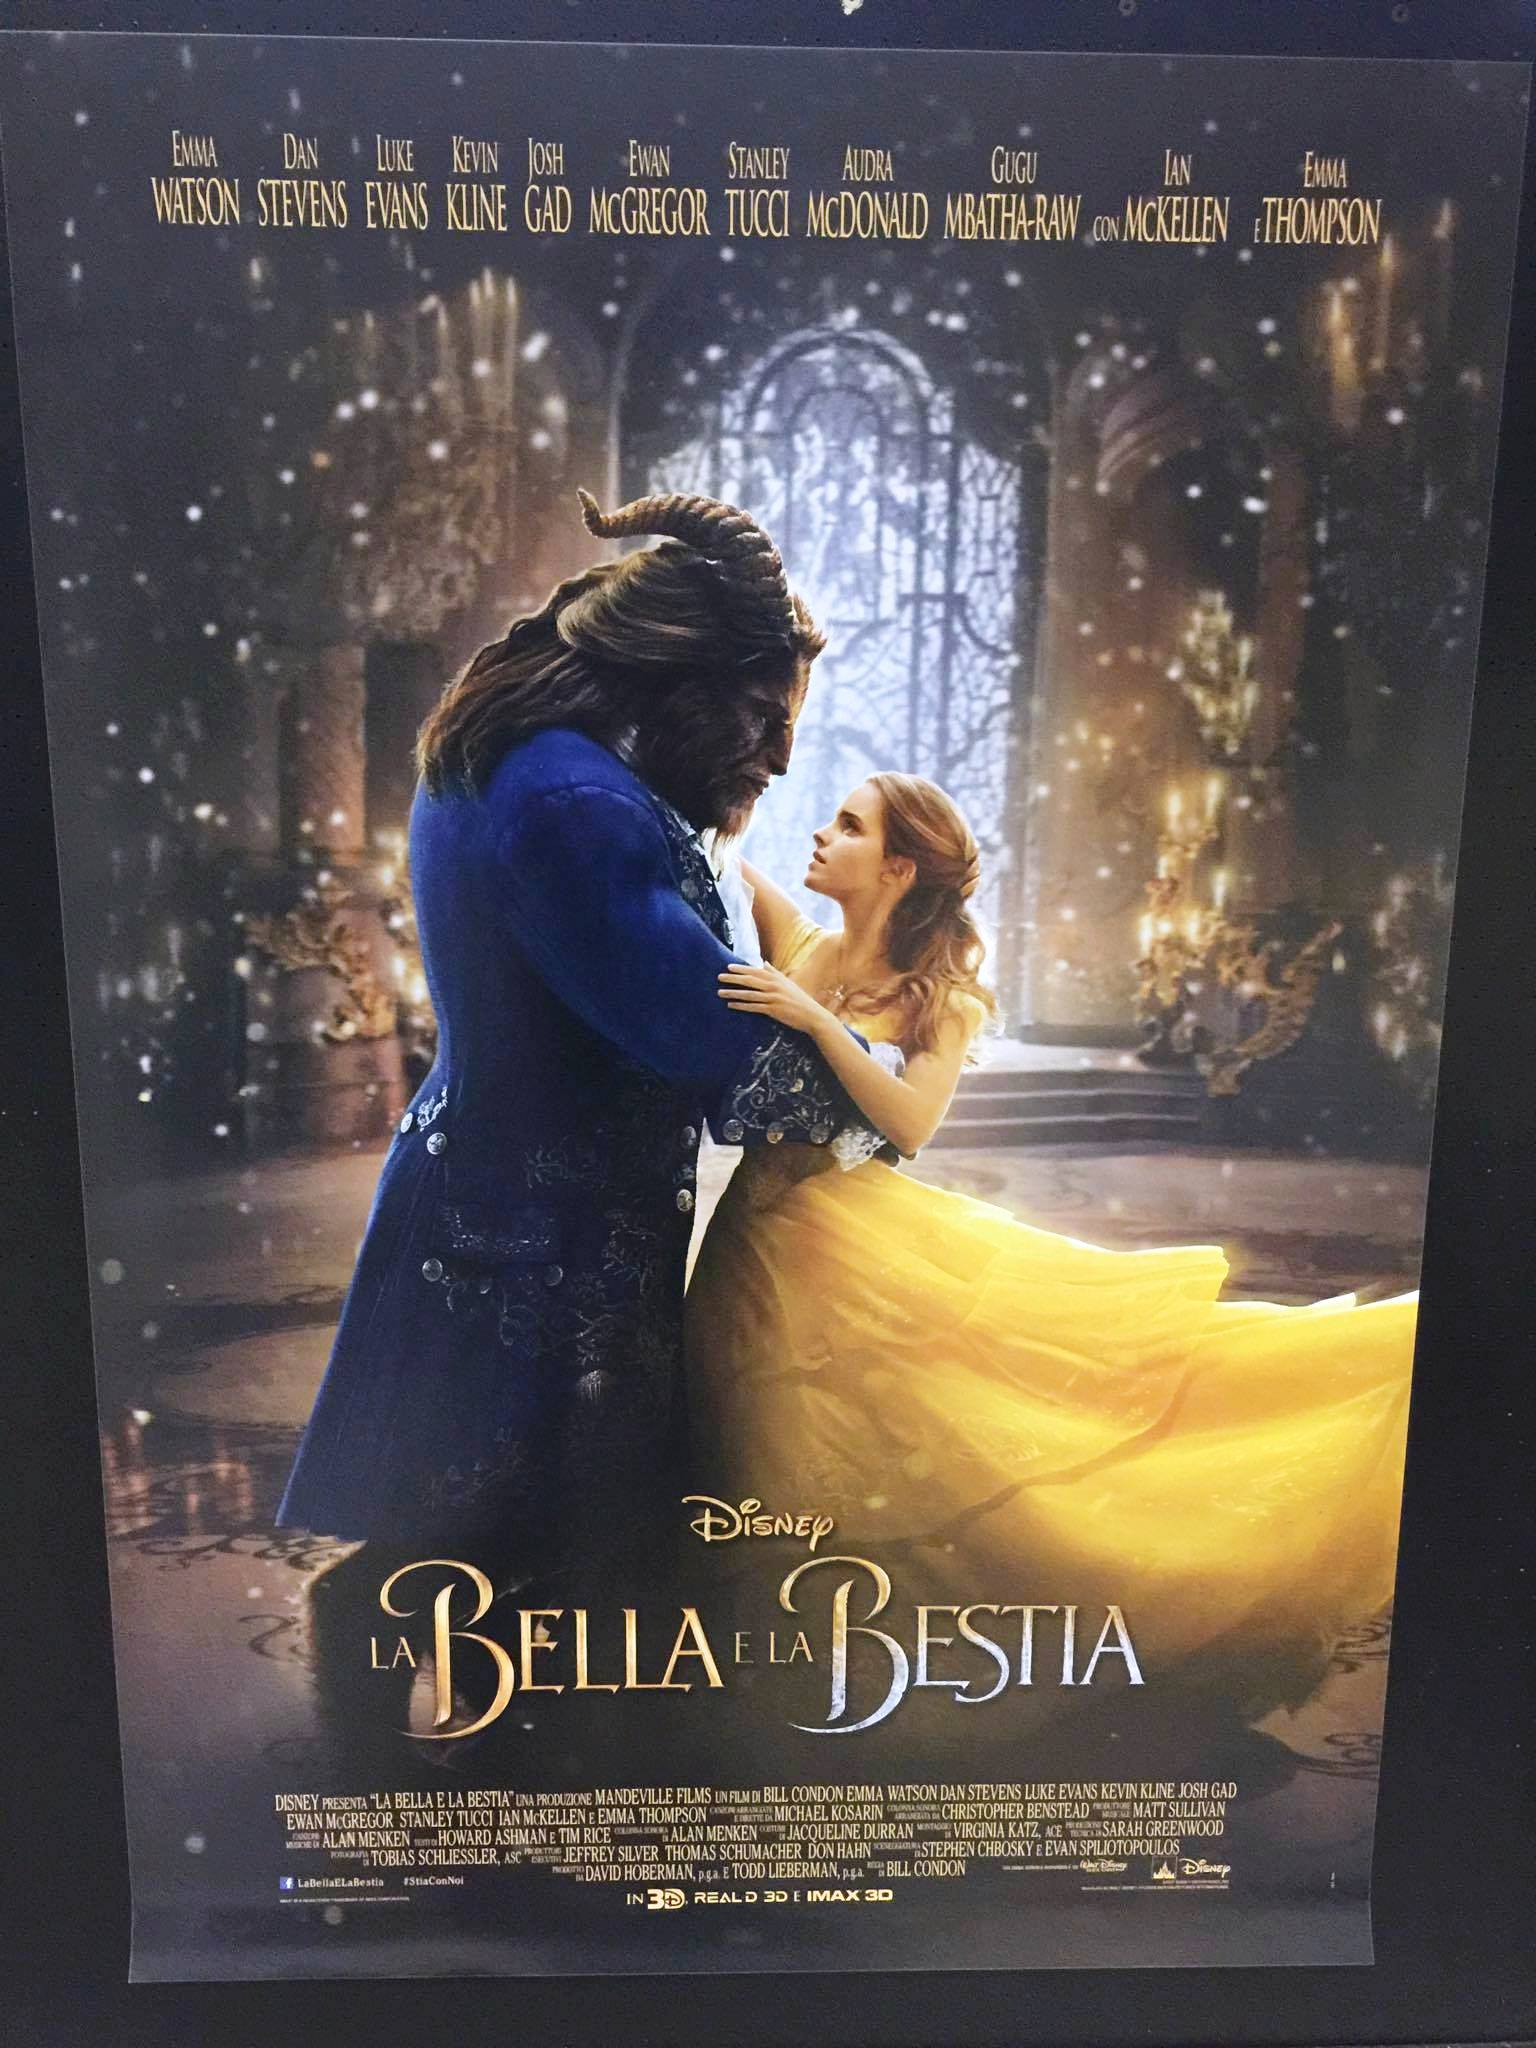 La bella e la bestia - Film (2017) - MYmovies.it